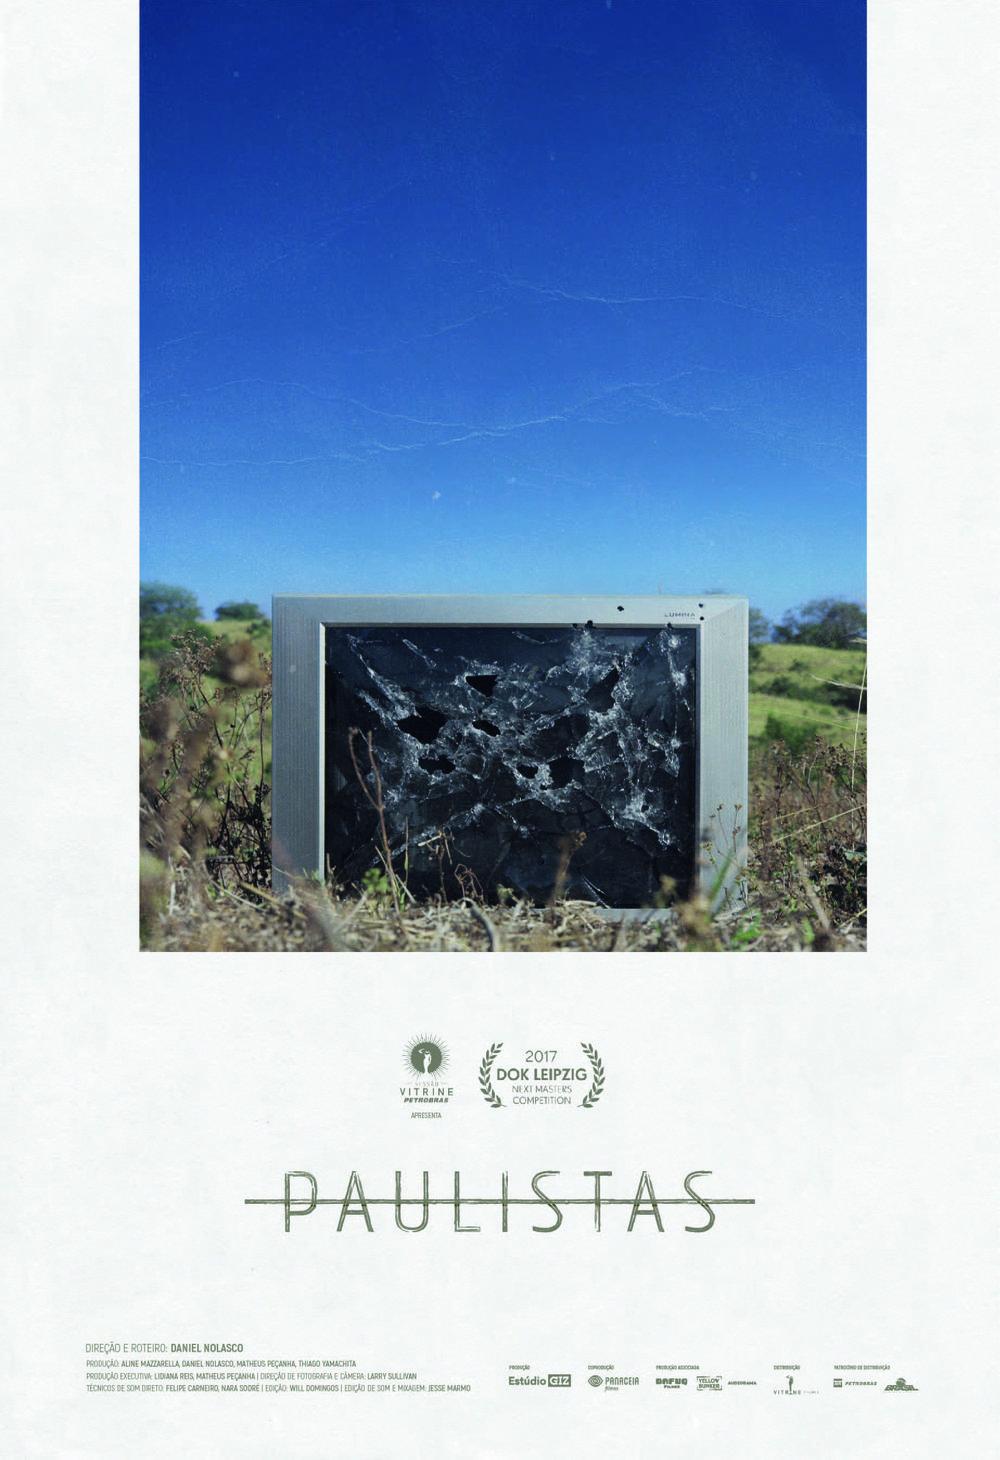 Paulistas